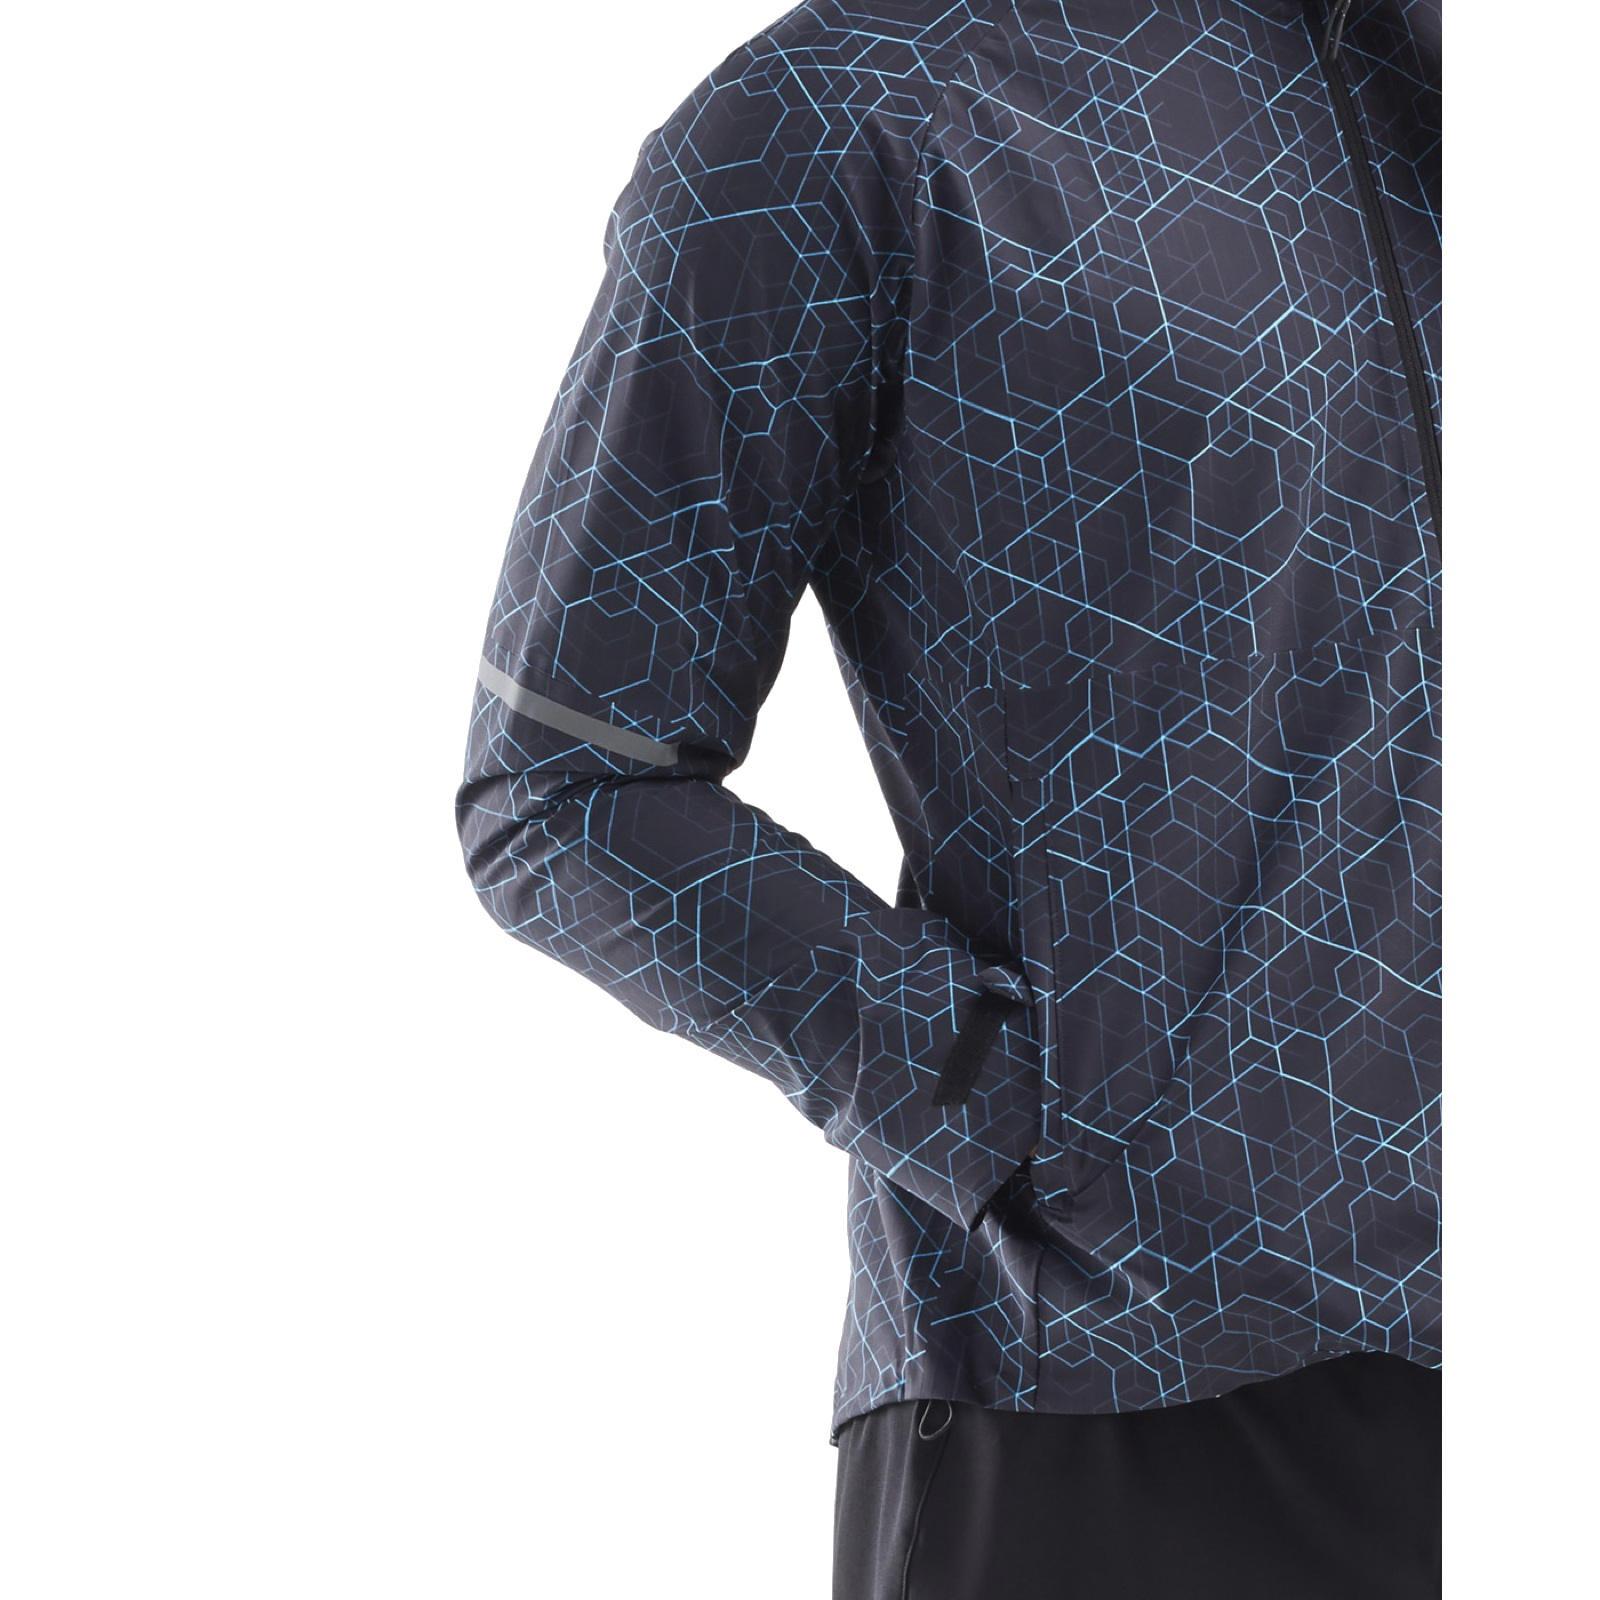 Image of 2XU GHST Waterproof Running Jacket - matrix black/silver reflective